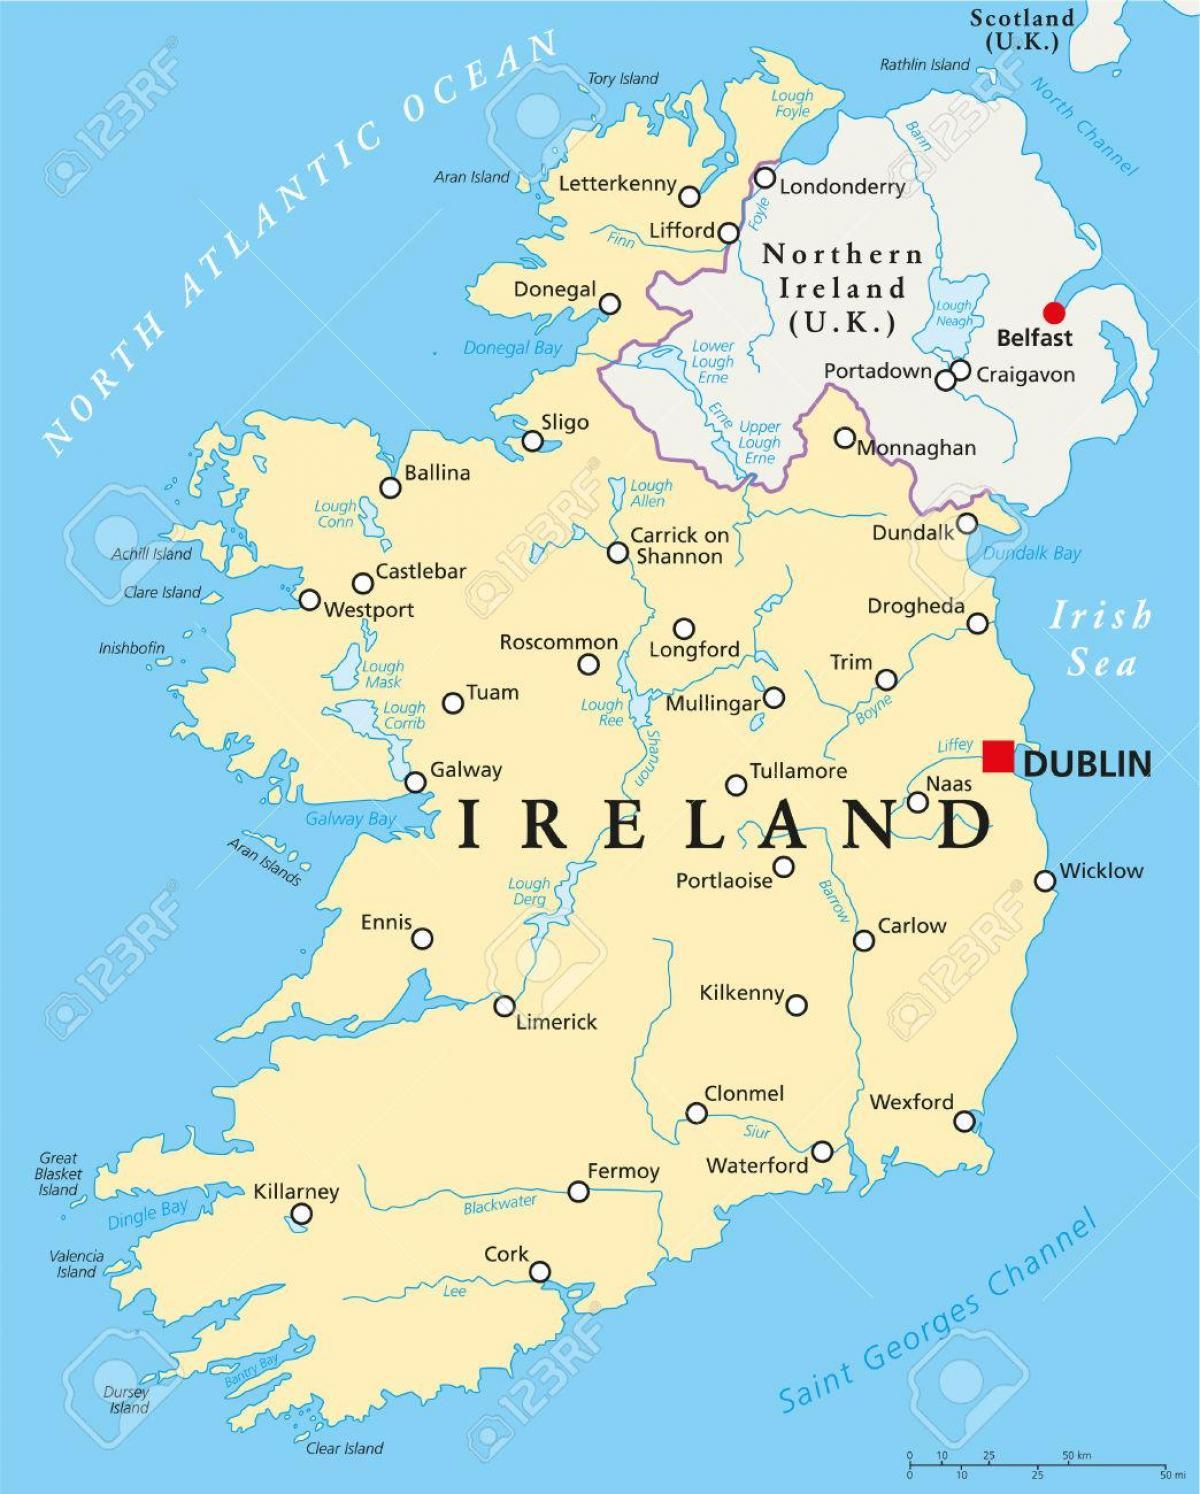 Dublin Ireland Map Dublin Map Ireland Ireland - Map of ireland